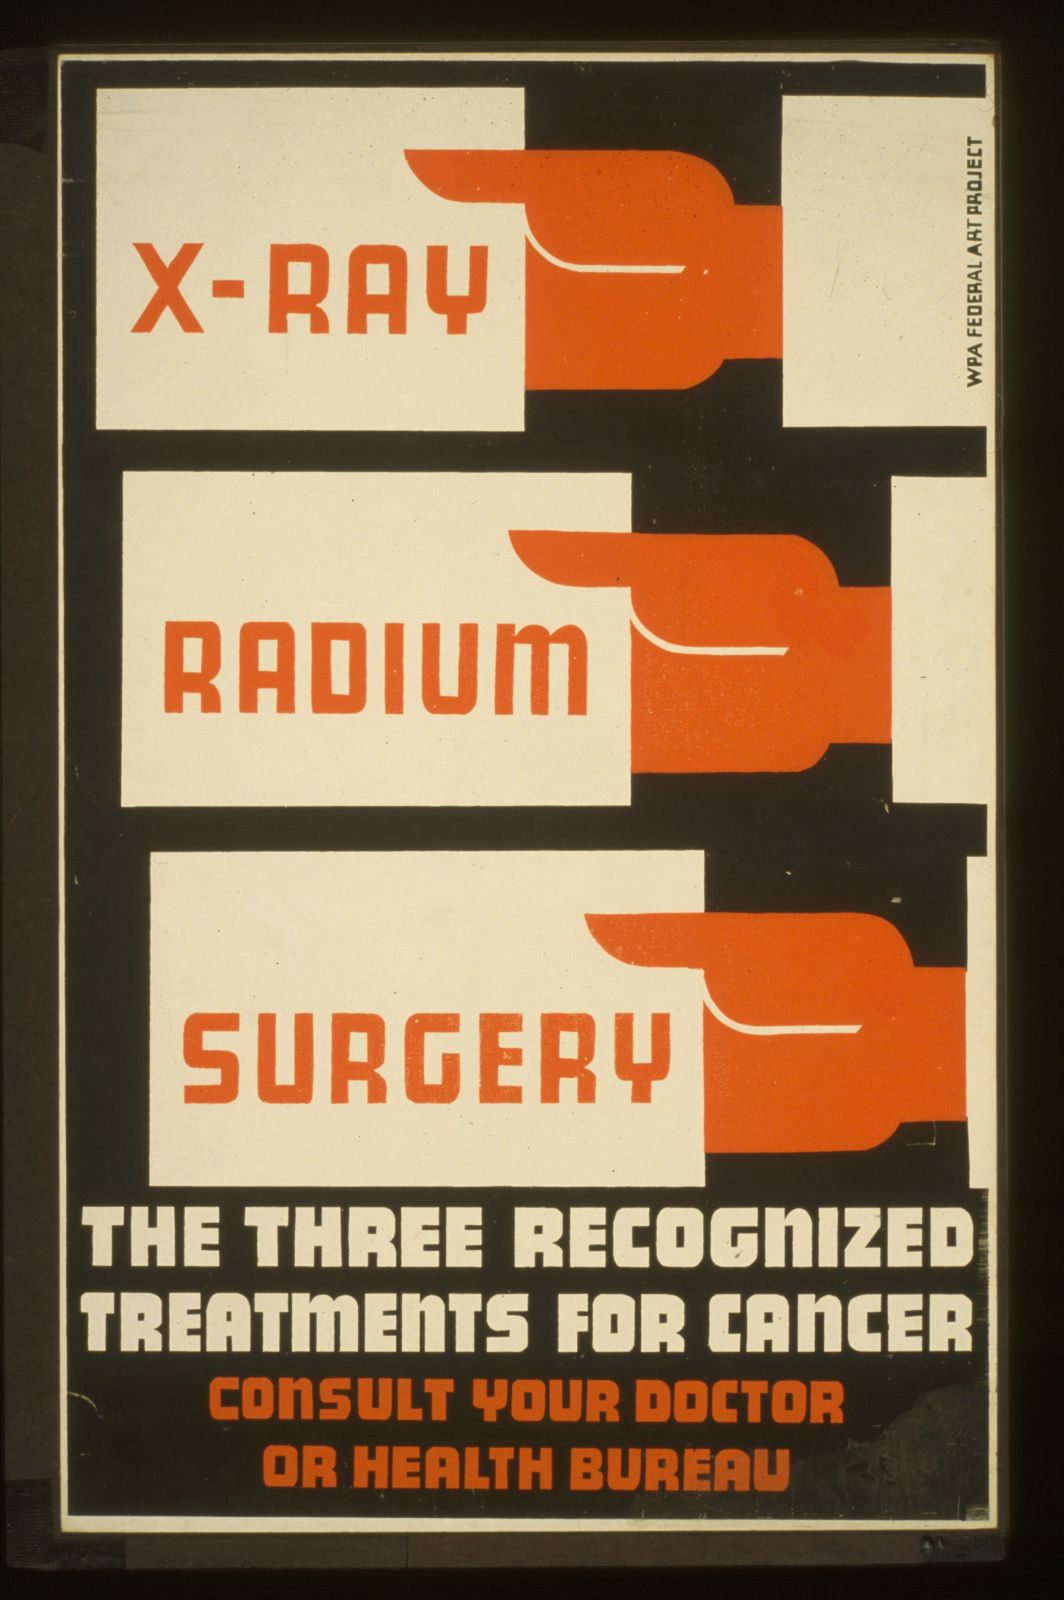 X-Ray, radium, surgery